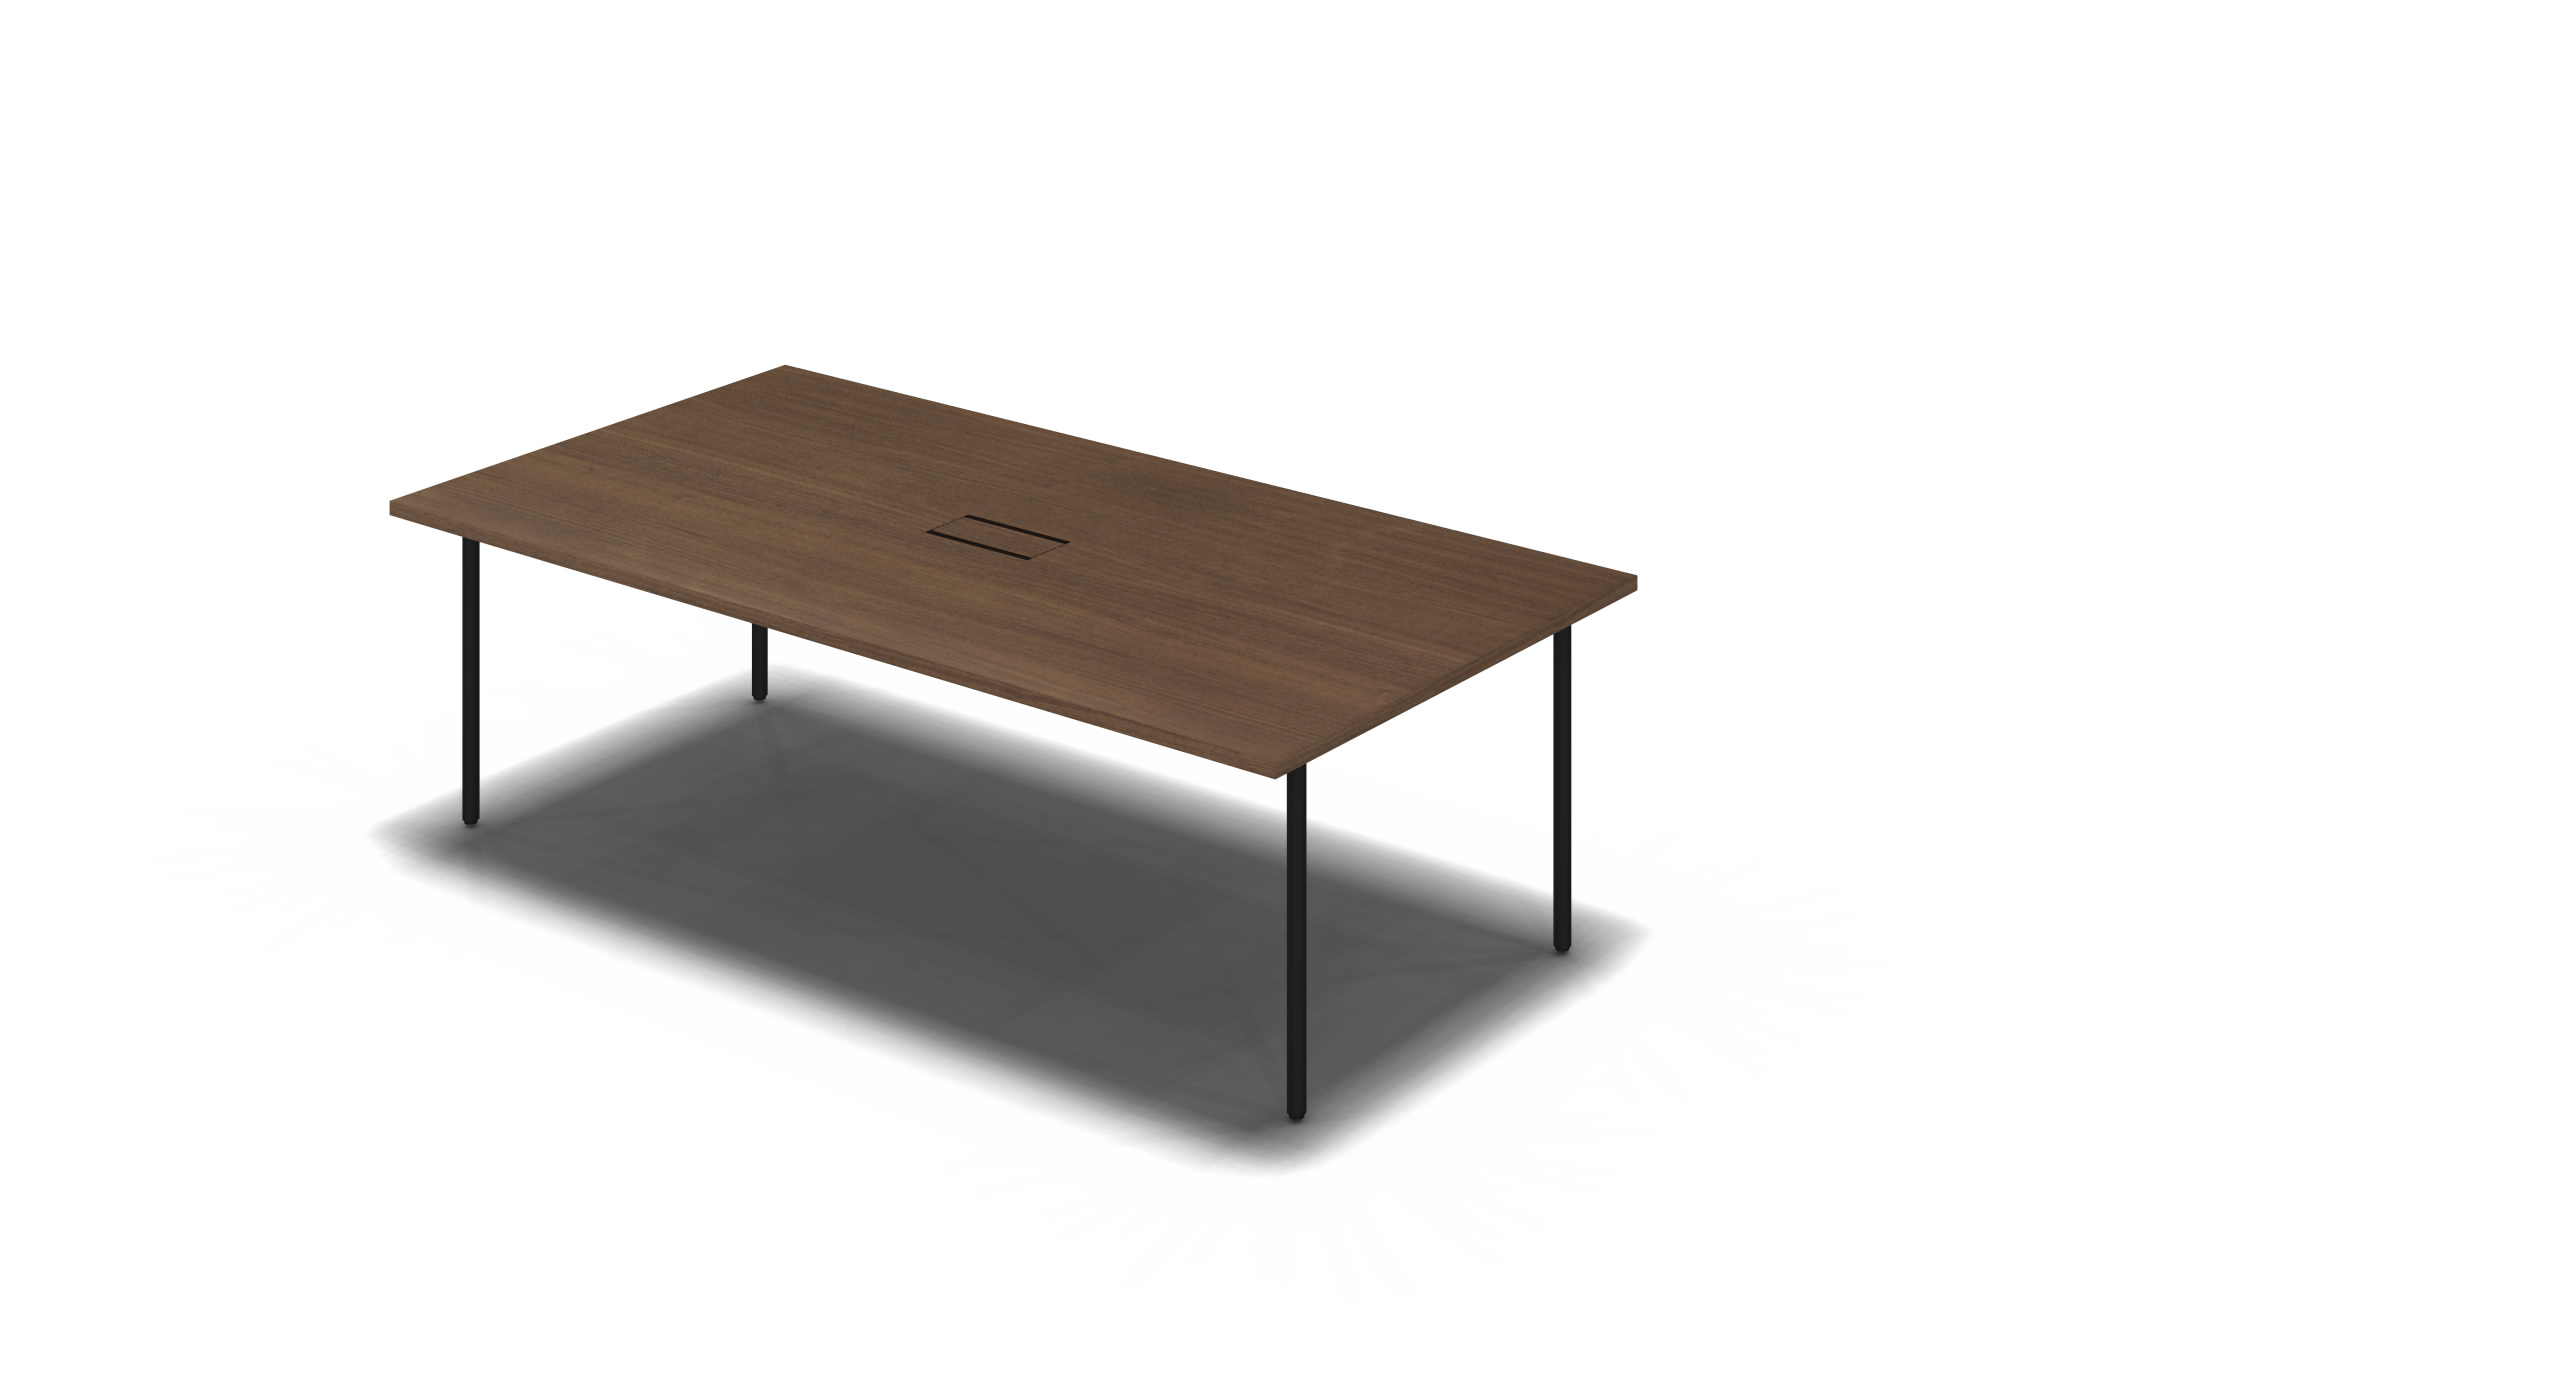 Table_Round_2100x1050_Black_Walnut_withOption